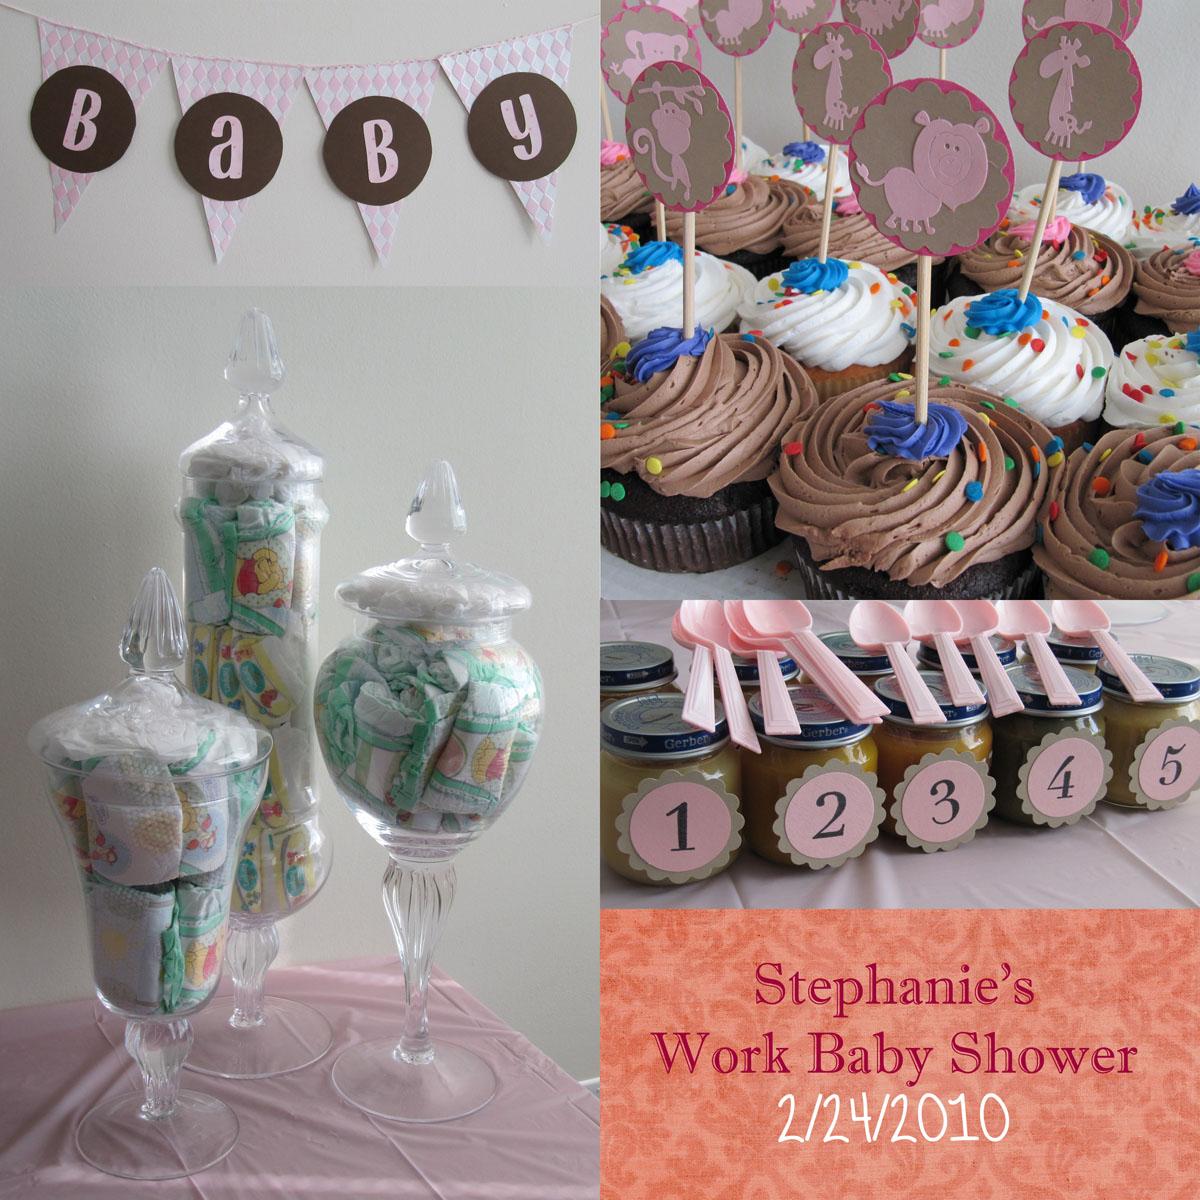 StephanieWorkBabyShowerCollage